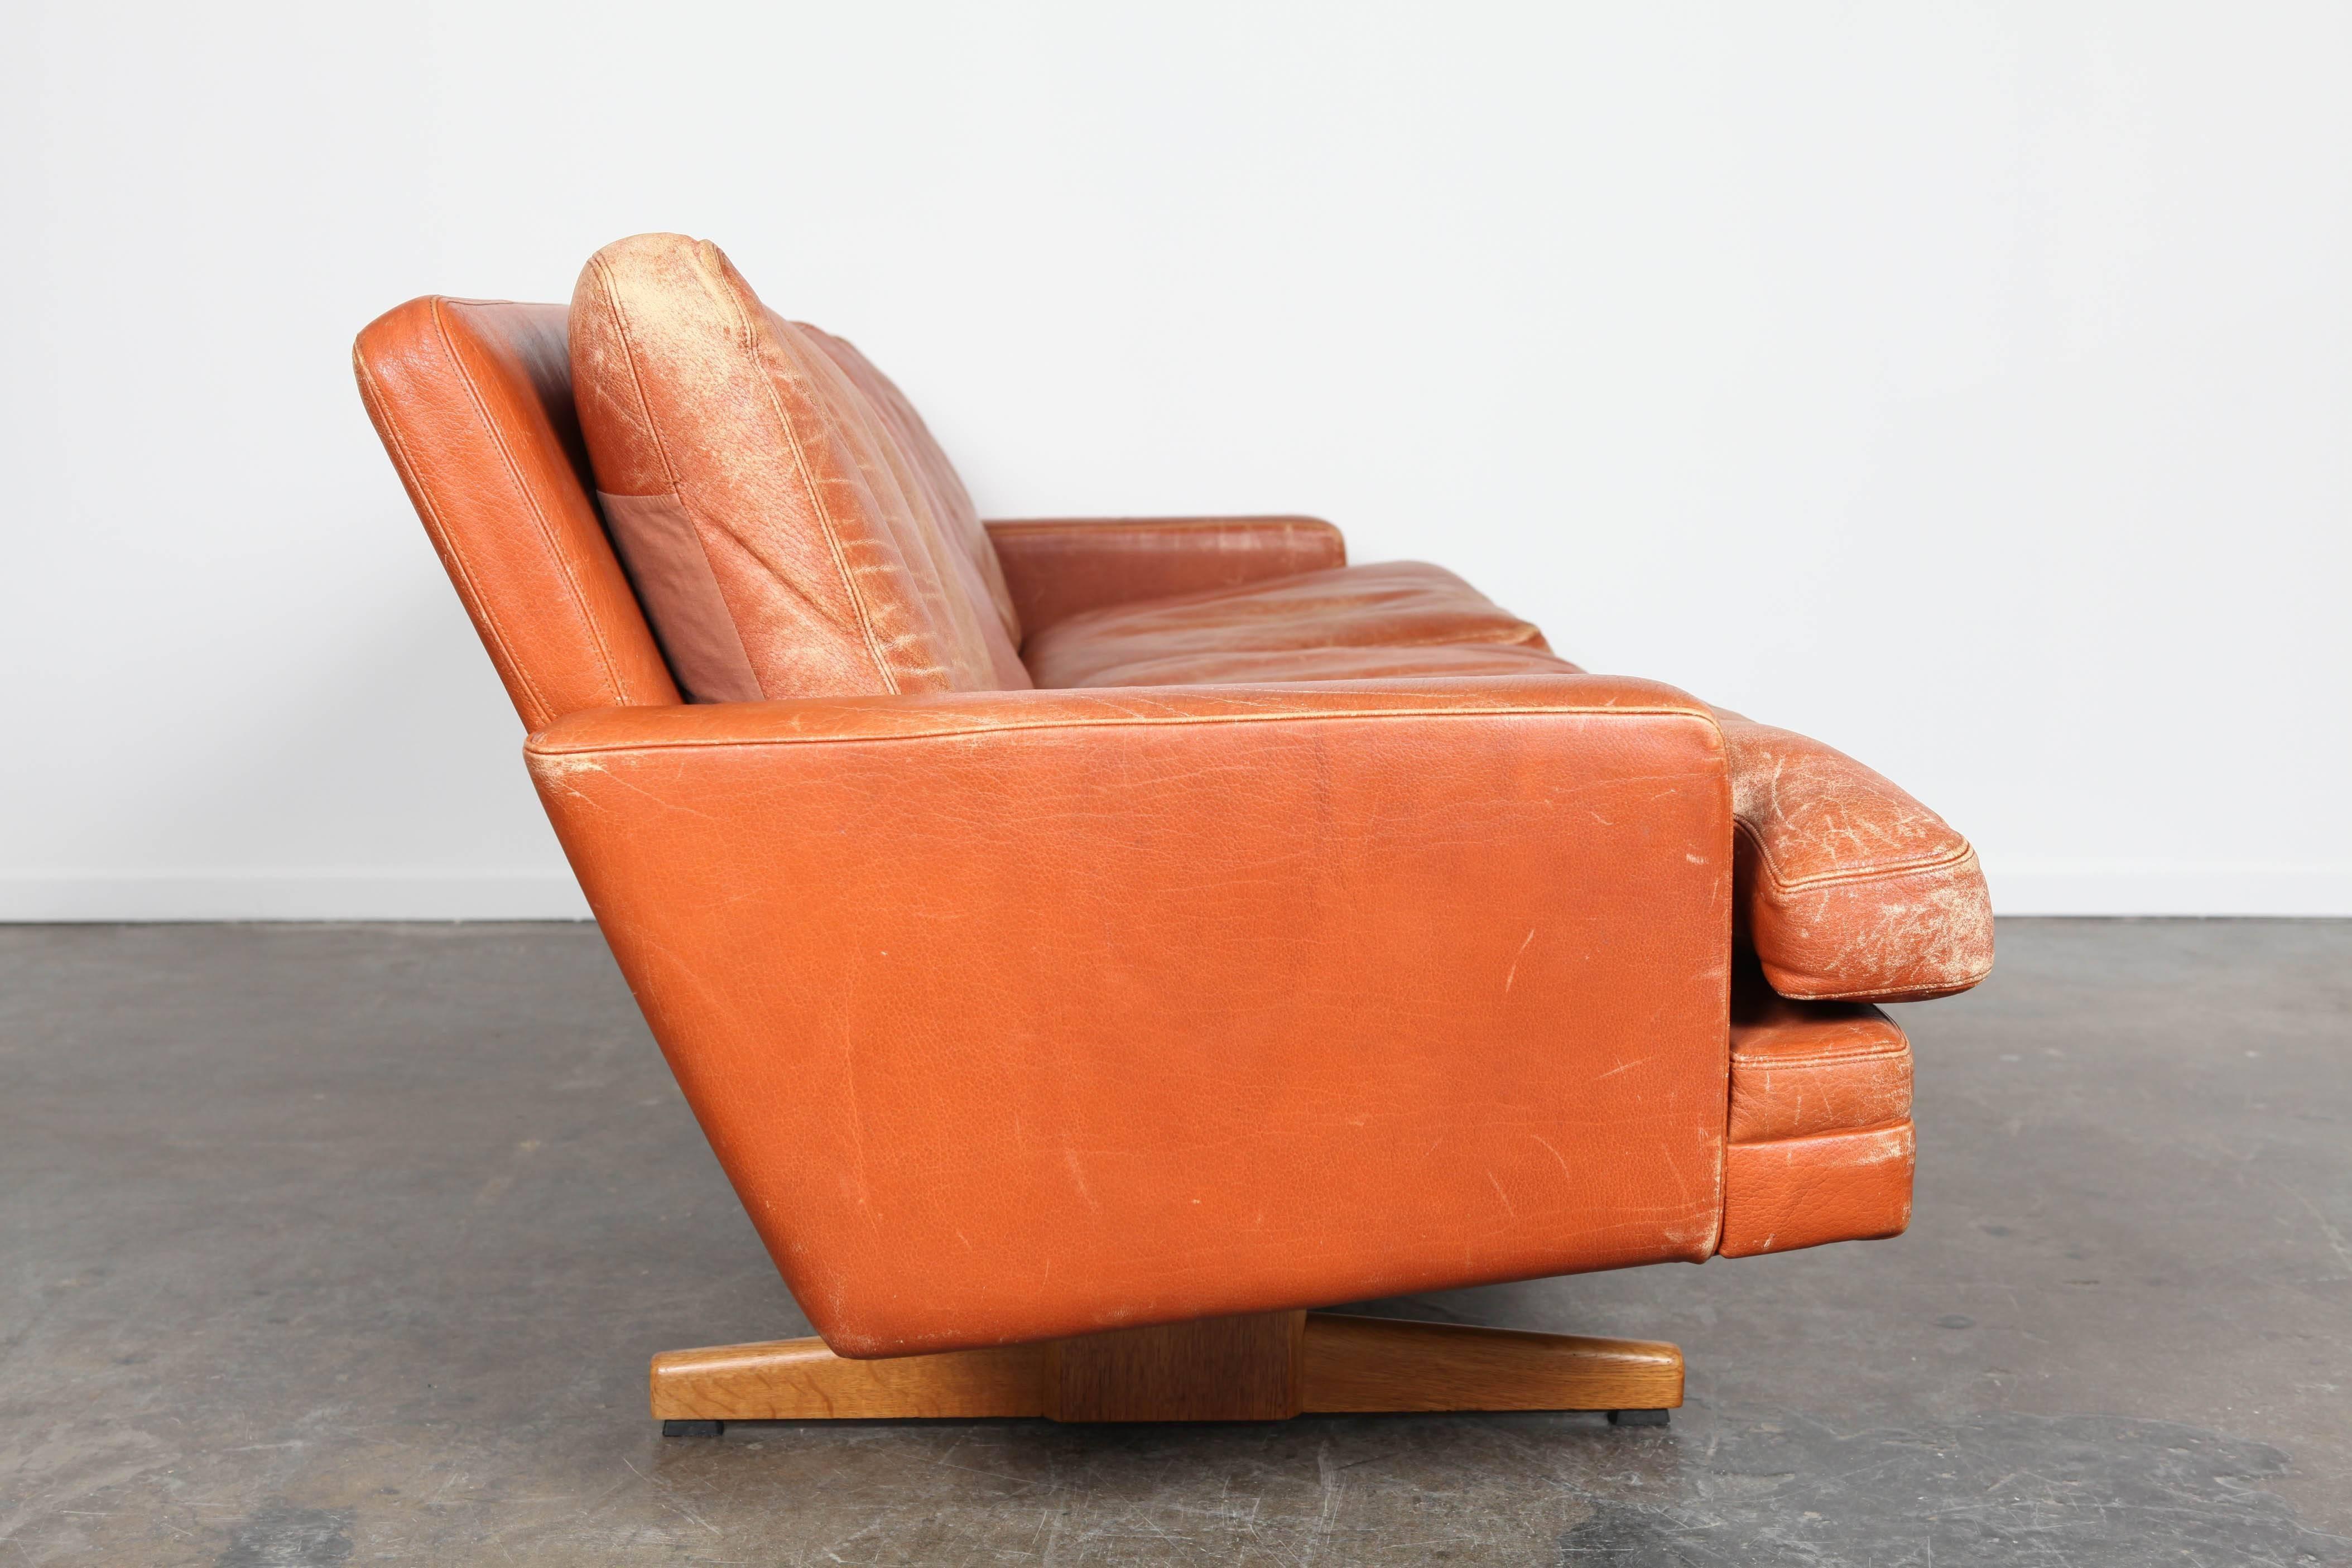 Mid 20th Century Norwegian Mid Century Modern Burnt Orange Leather Sofa By  Fredrik